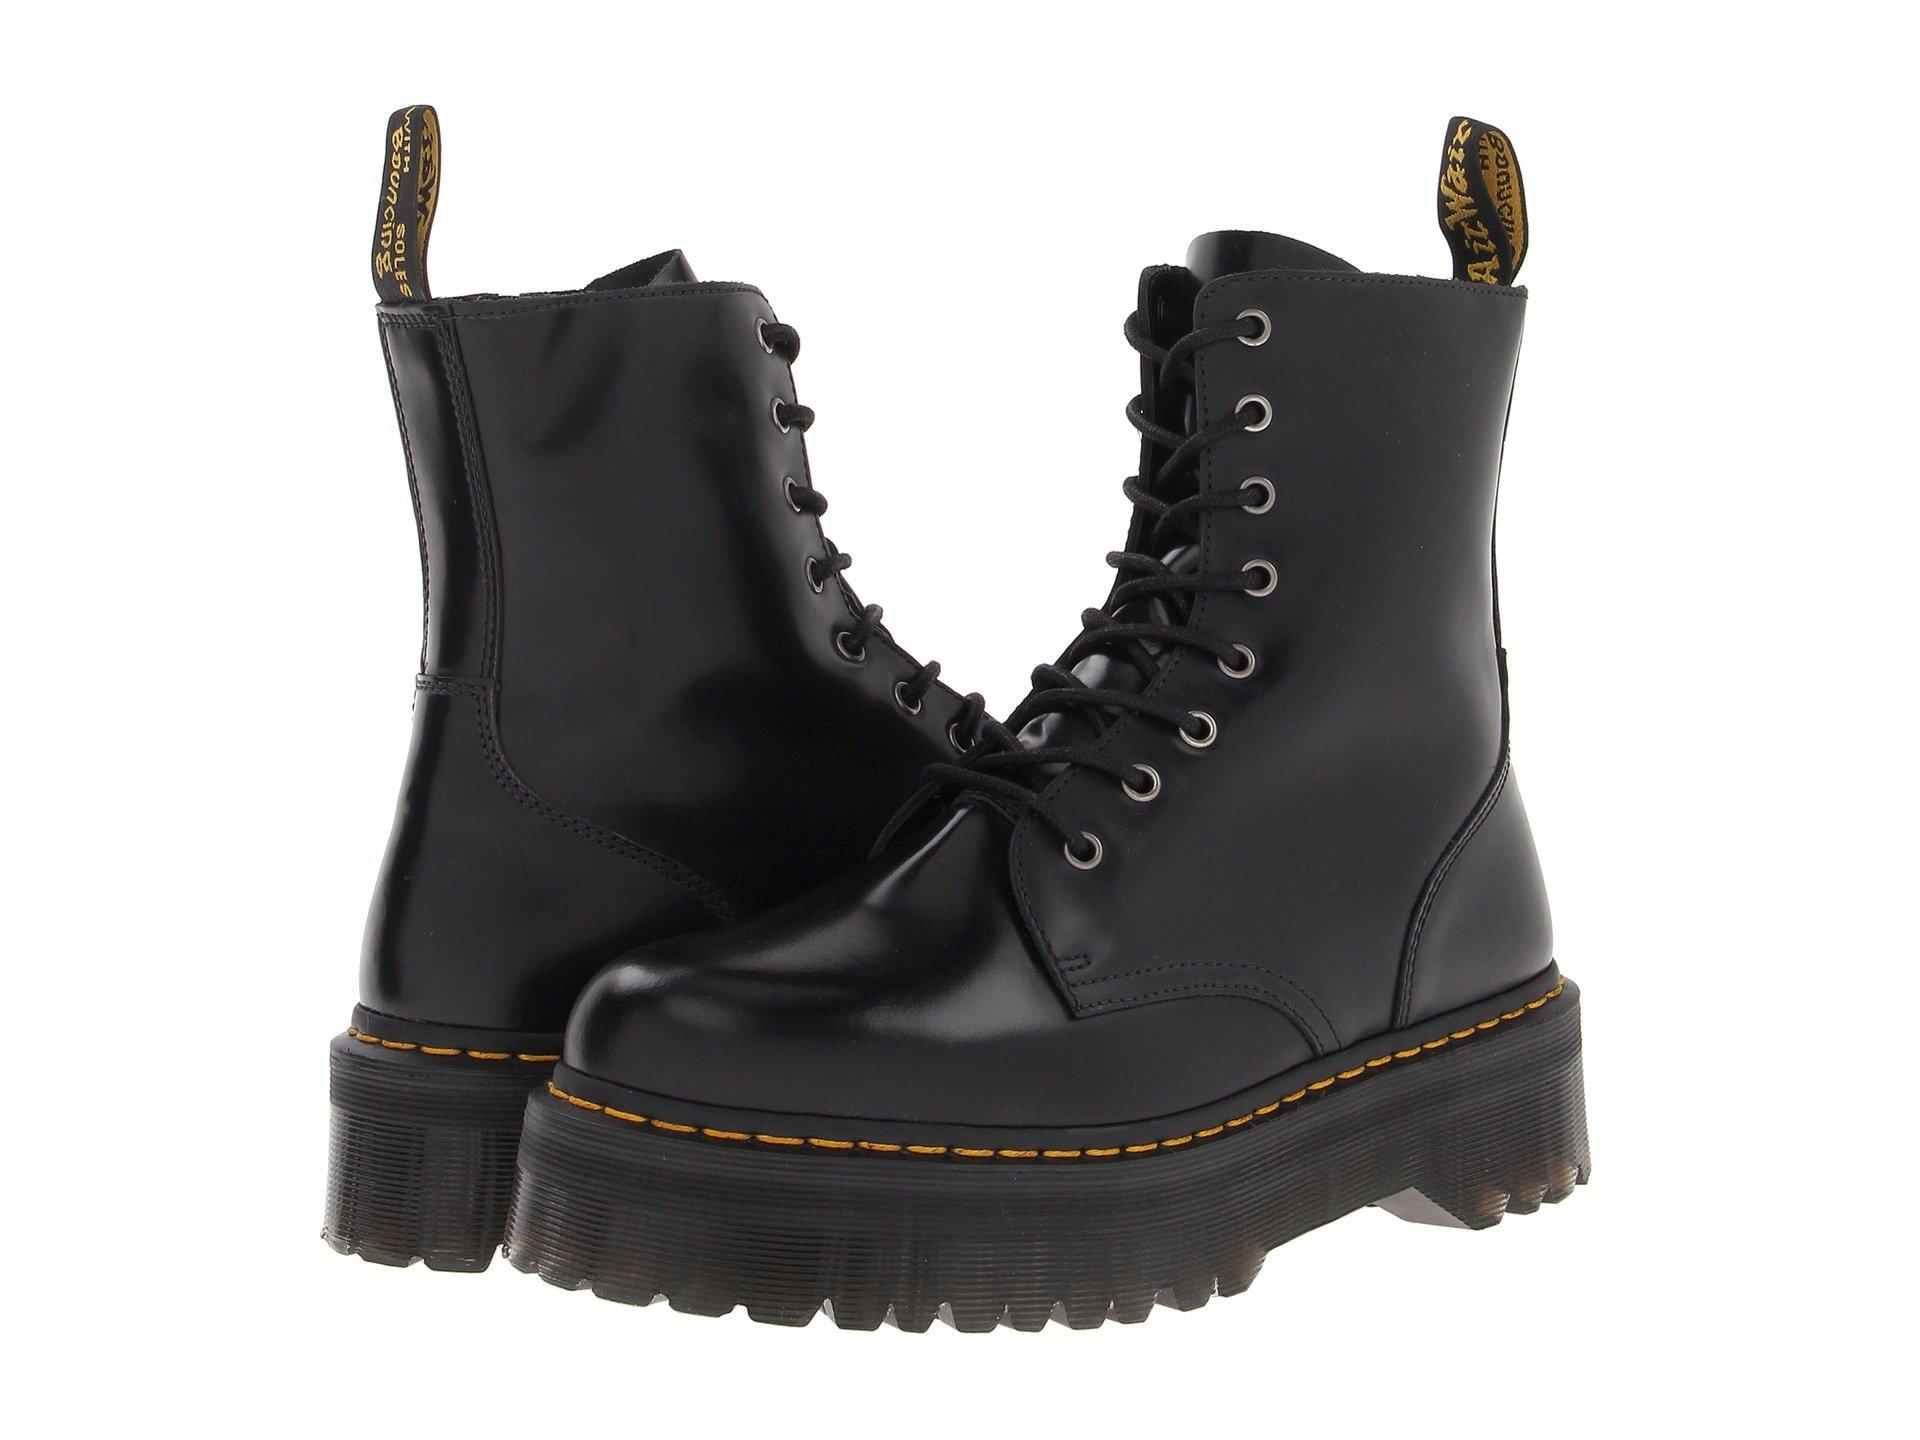 eef73e5ec8e Men's Dr. Martens Boots + FREE SHIPPING | Shoes | Zappos.com